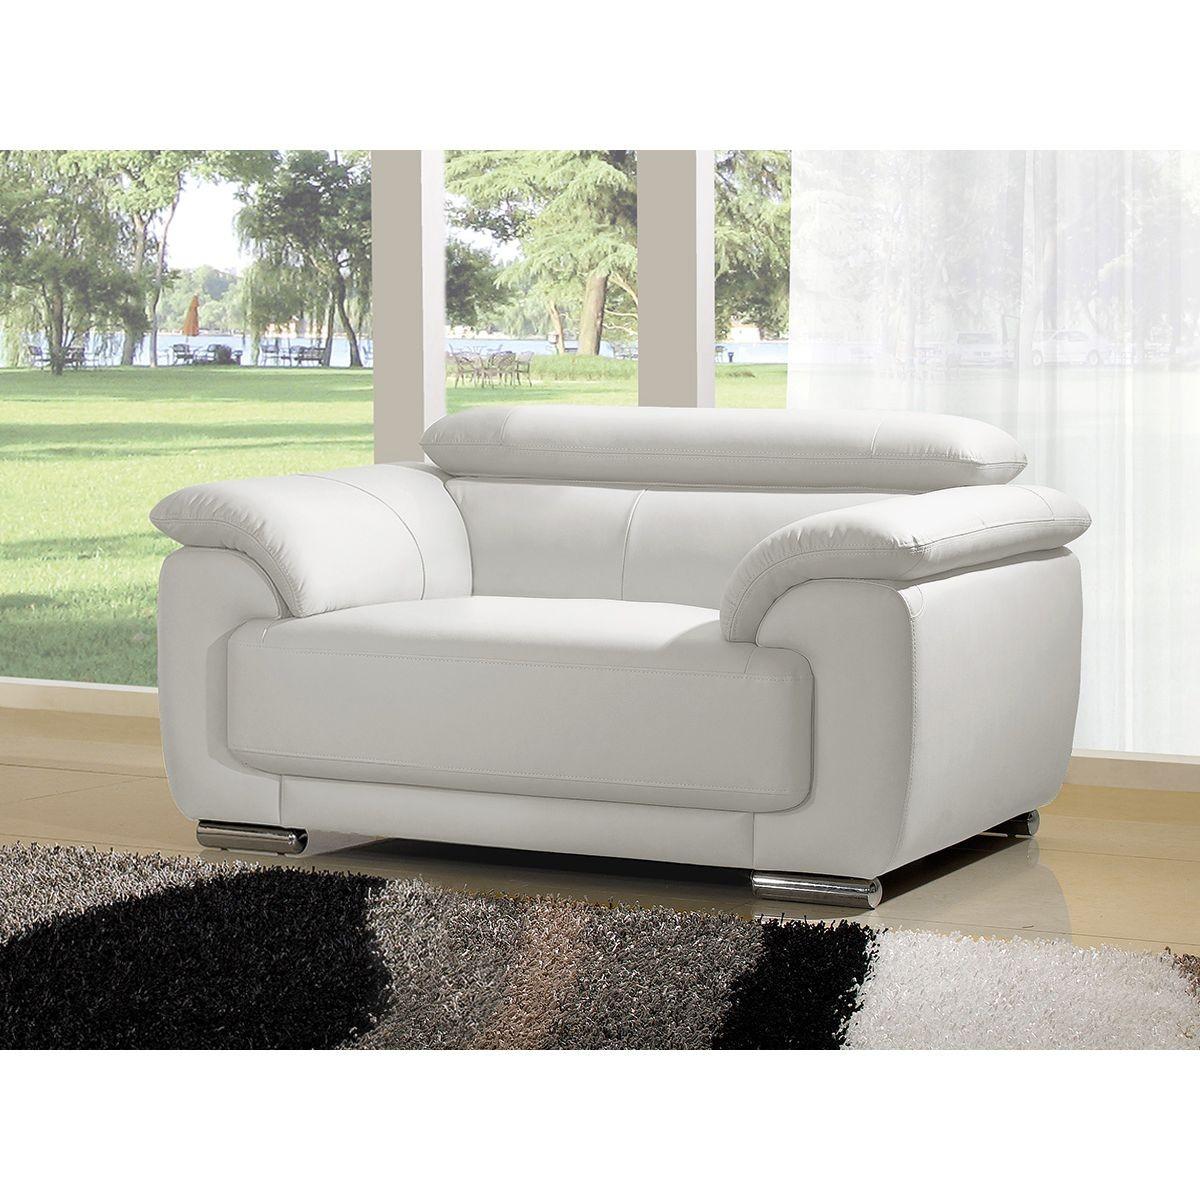 Epingle Sur Dream Sofas